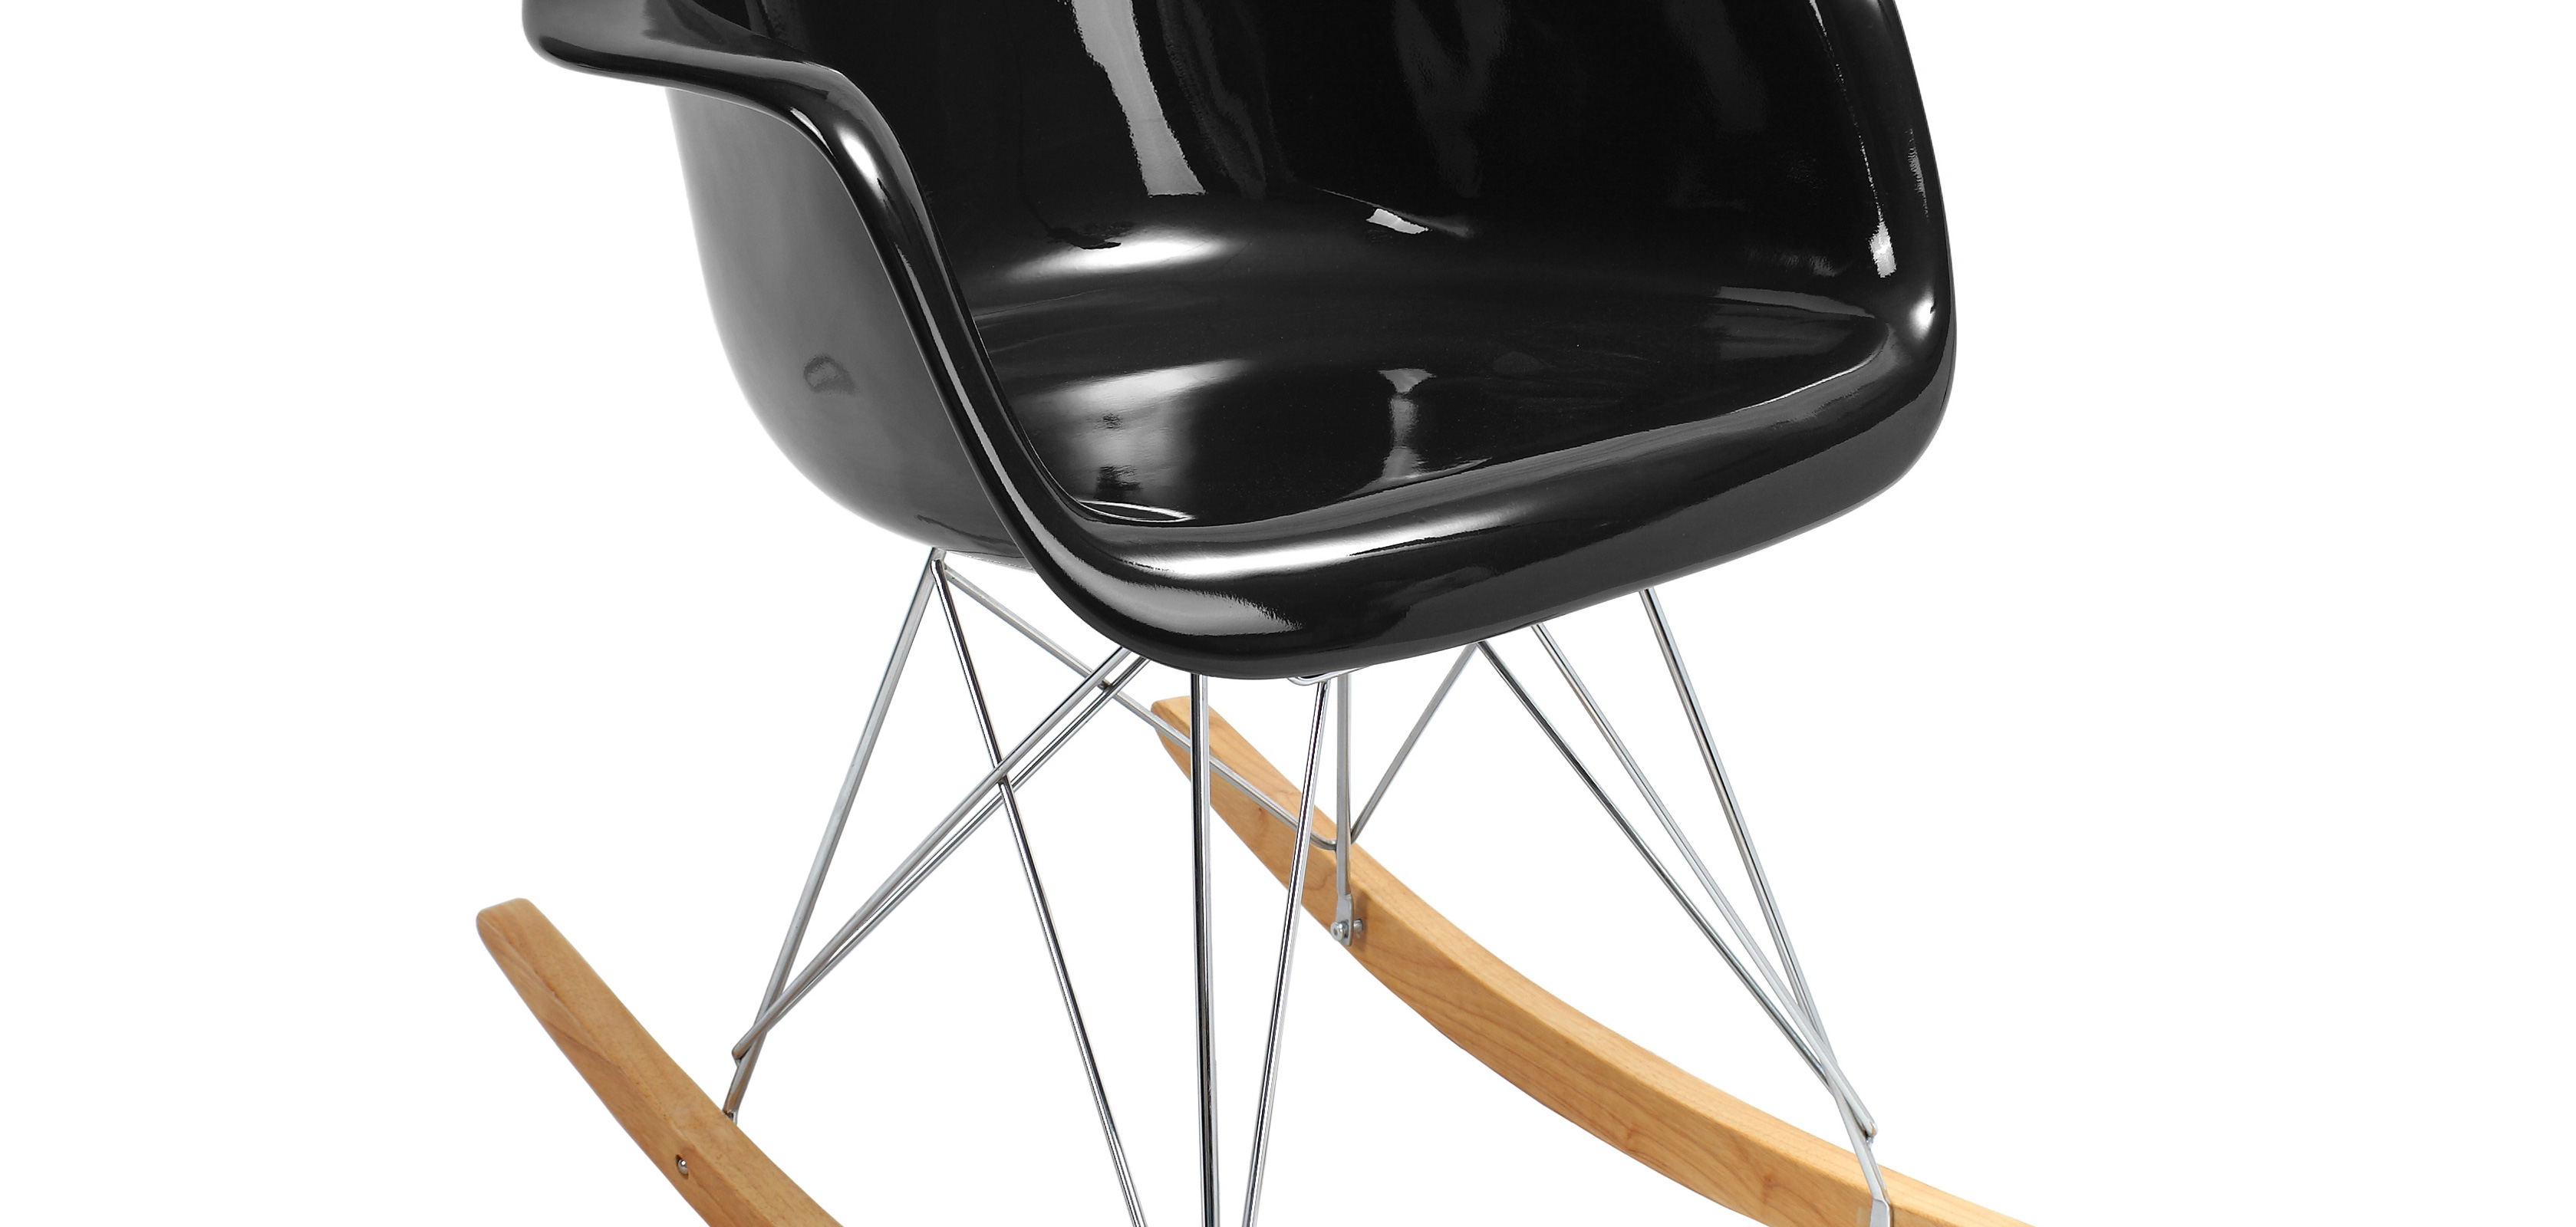 rar schaukelstuhl charles eames style. Black Bedroom Furniture Sets. Home Design Ideas